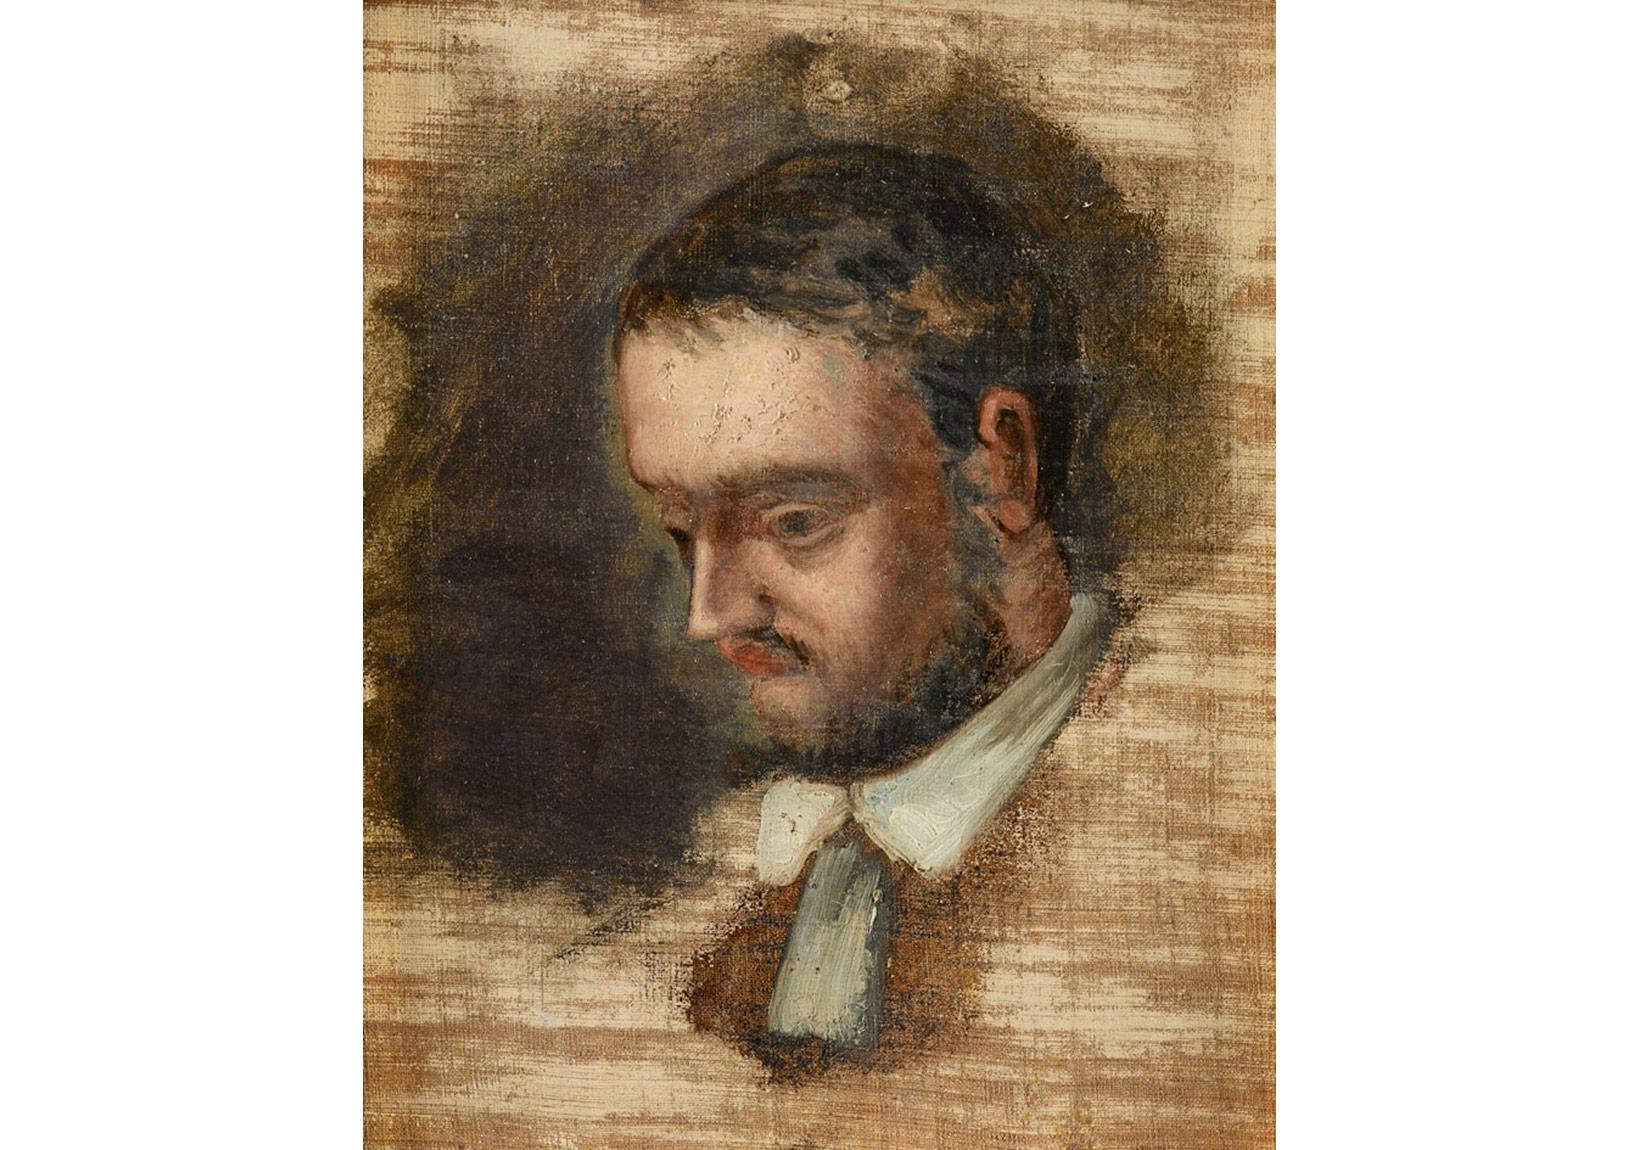 Emile Zola (Paul Cézanne)